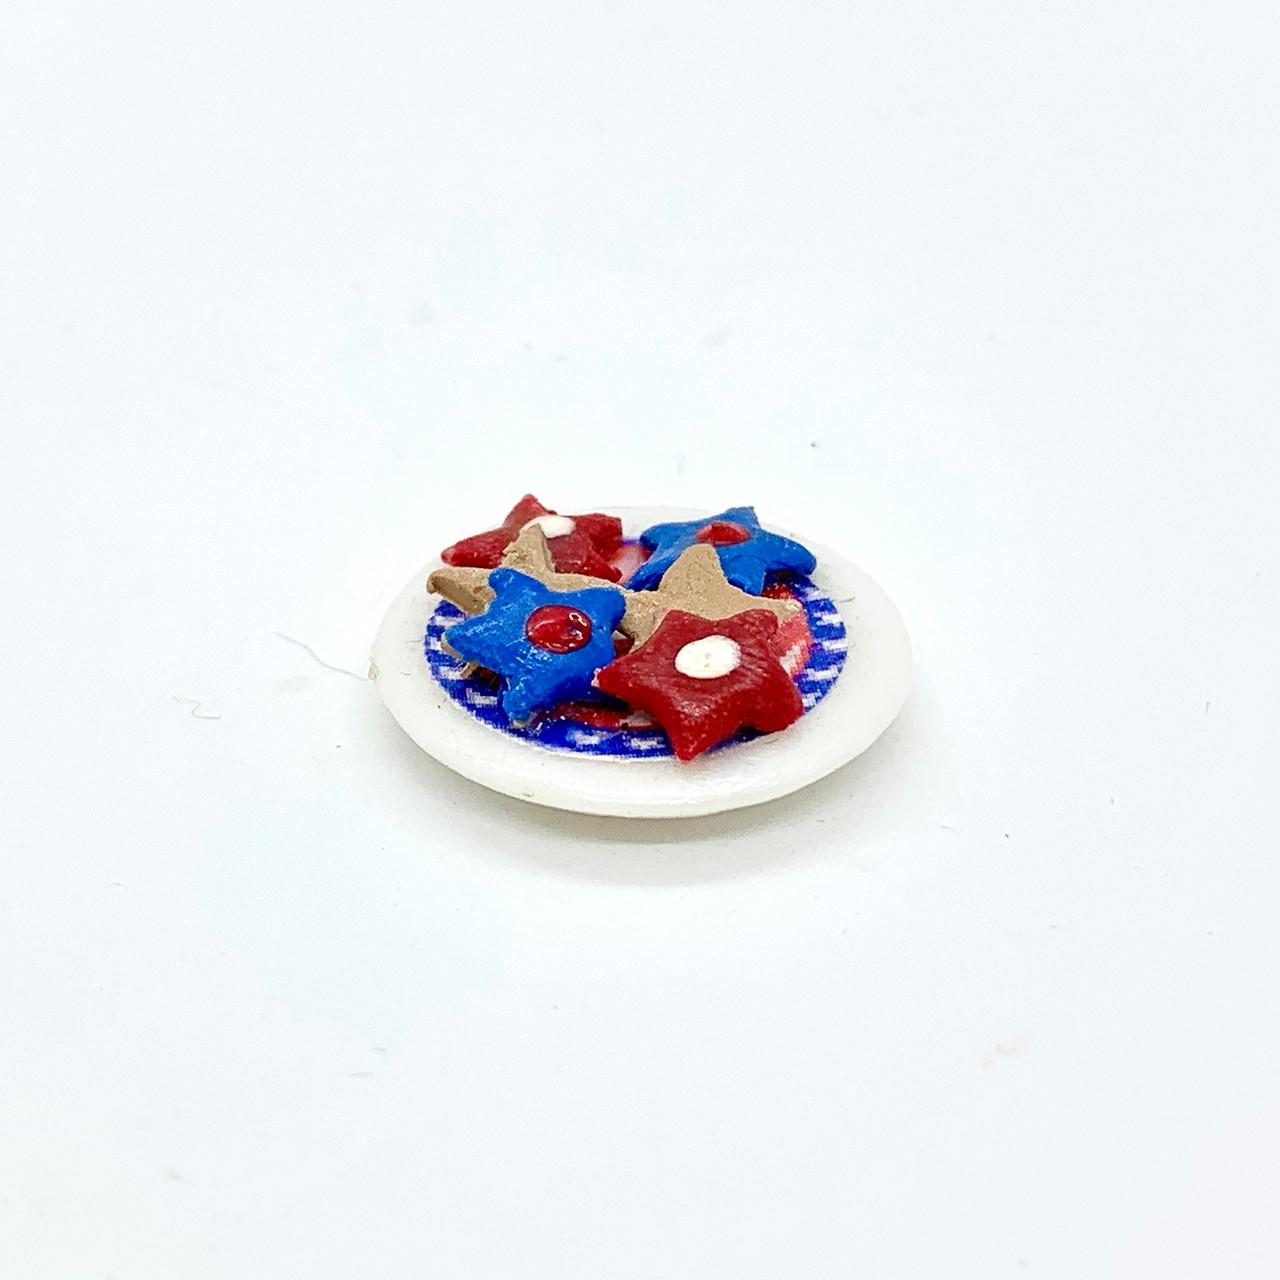 Plate of Dollhouse Miniature Patriotic Cookies (RND178)